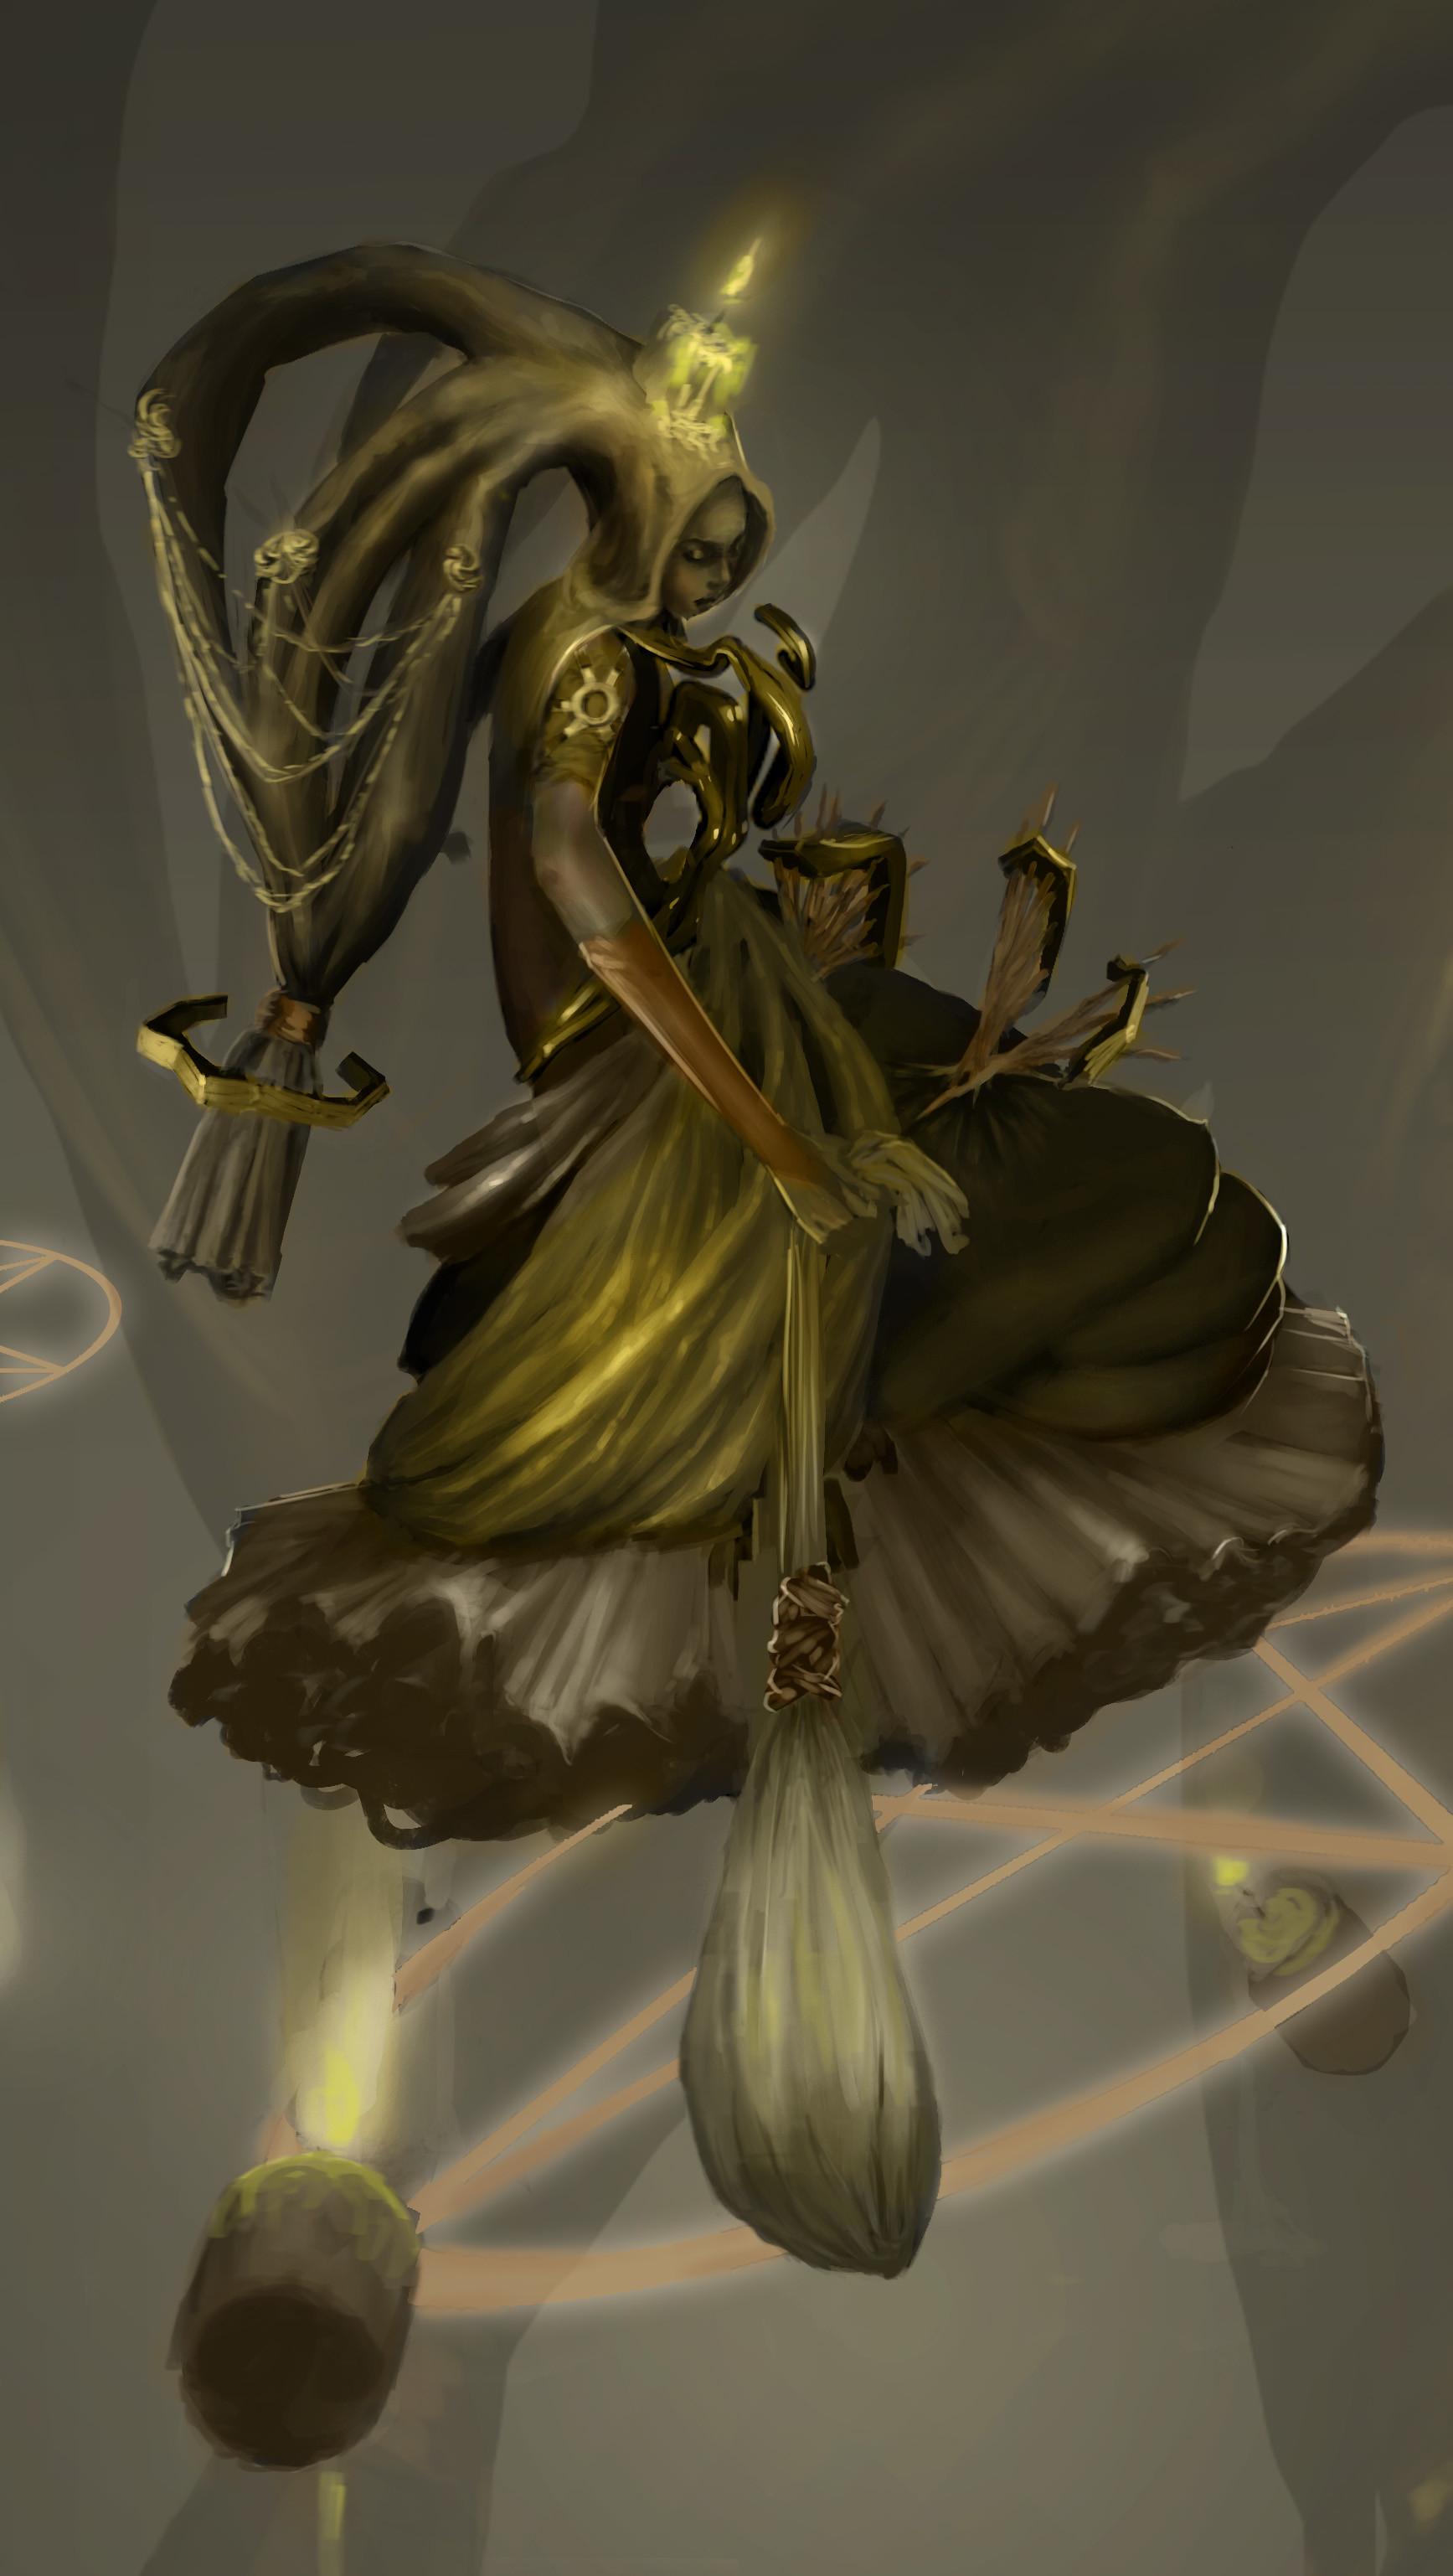 Jocelyn short witch 5 rendered better